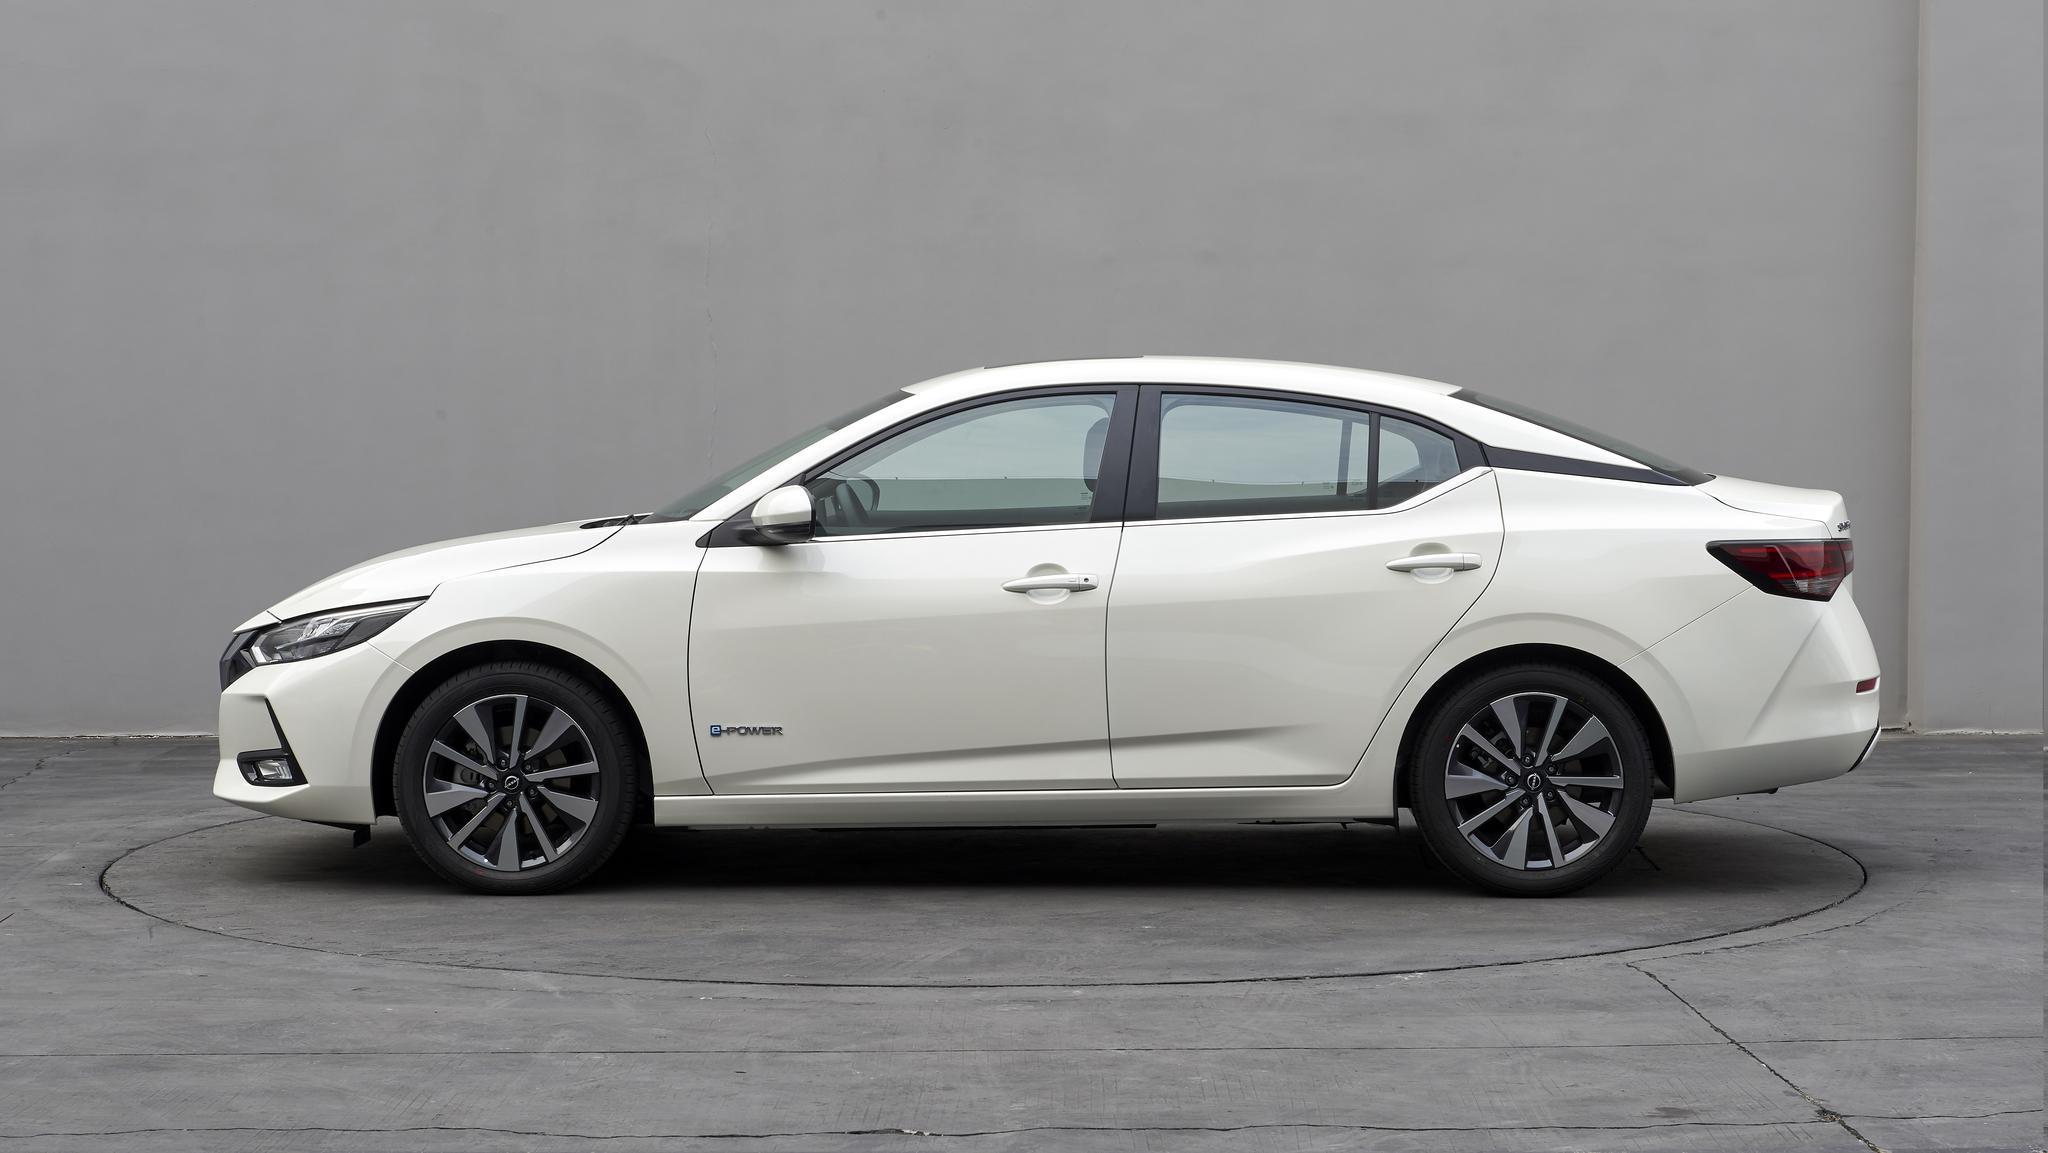 e-POWER技术首款车型 e-POWER轩逸申报图曝光